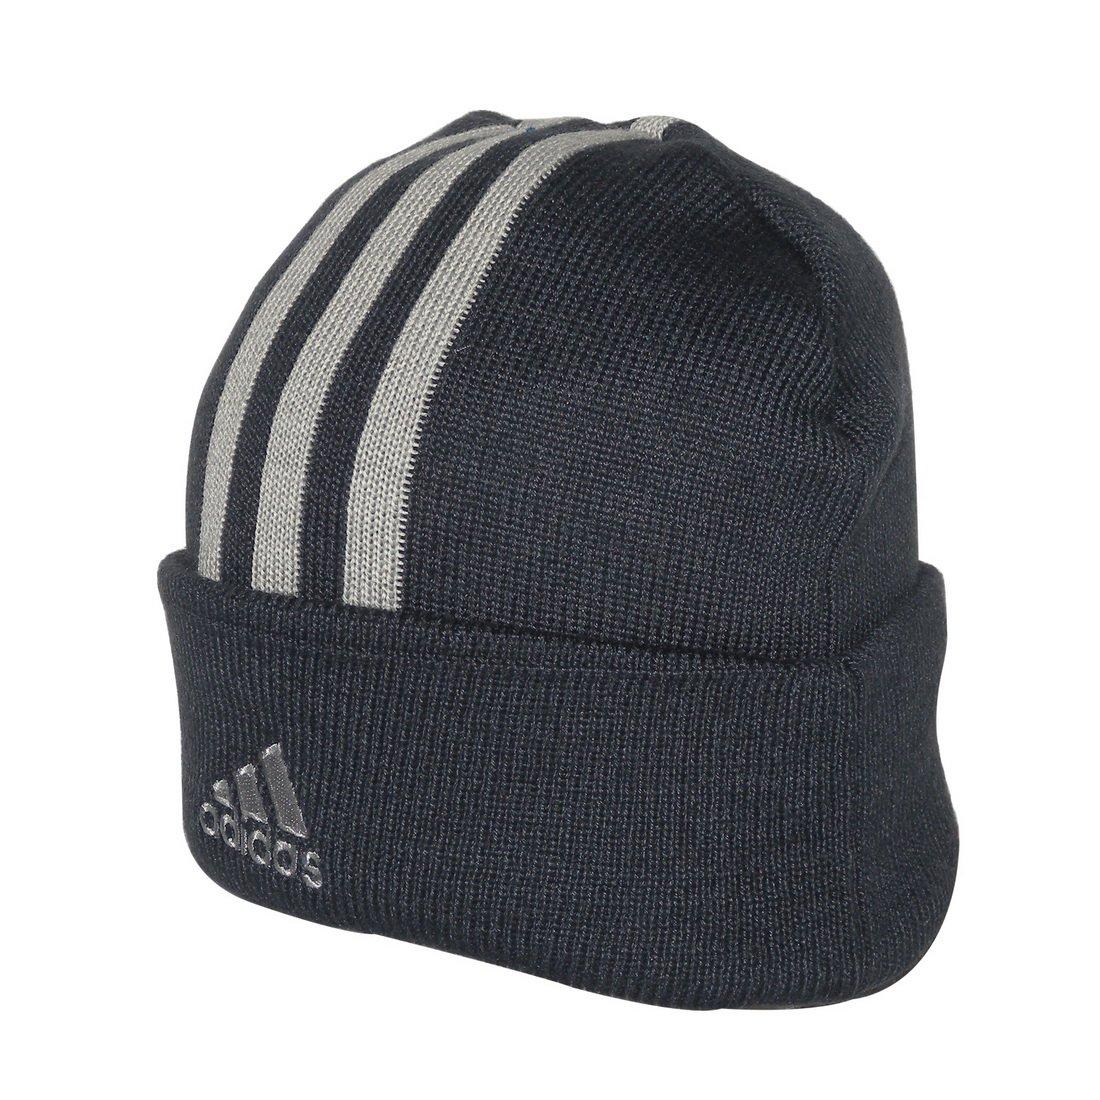 2a0de635df1 Adidas Adult Essentials 3 Stripe Warm Ski   Skate Beanie   Winter Hat - One  Size Fits All  Amazon.co.uk  Clothing